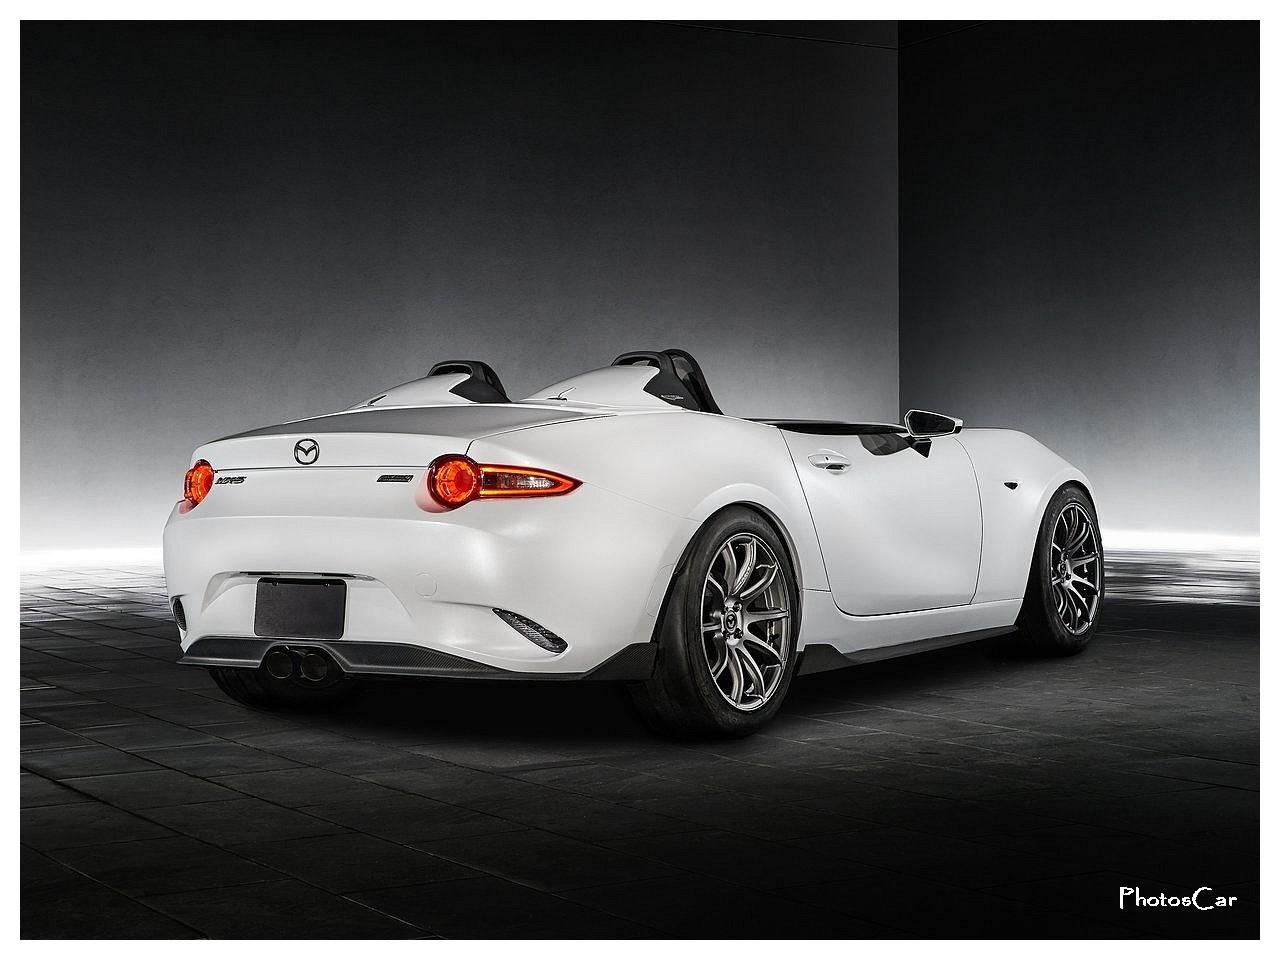 2016 Mazda MX-5 Speedster Evolution Concept